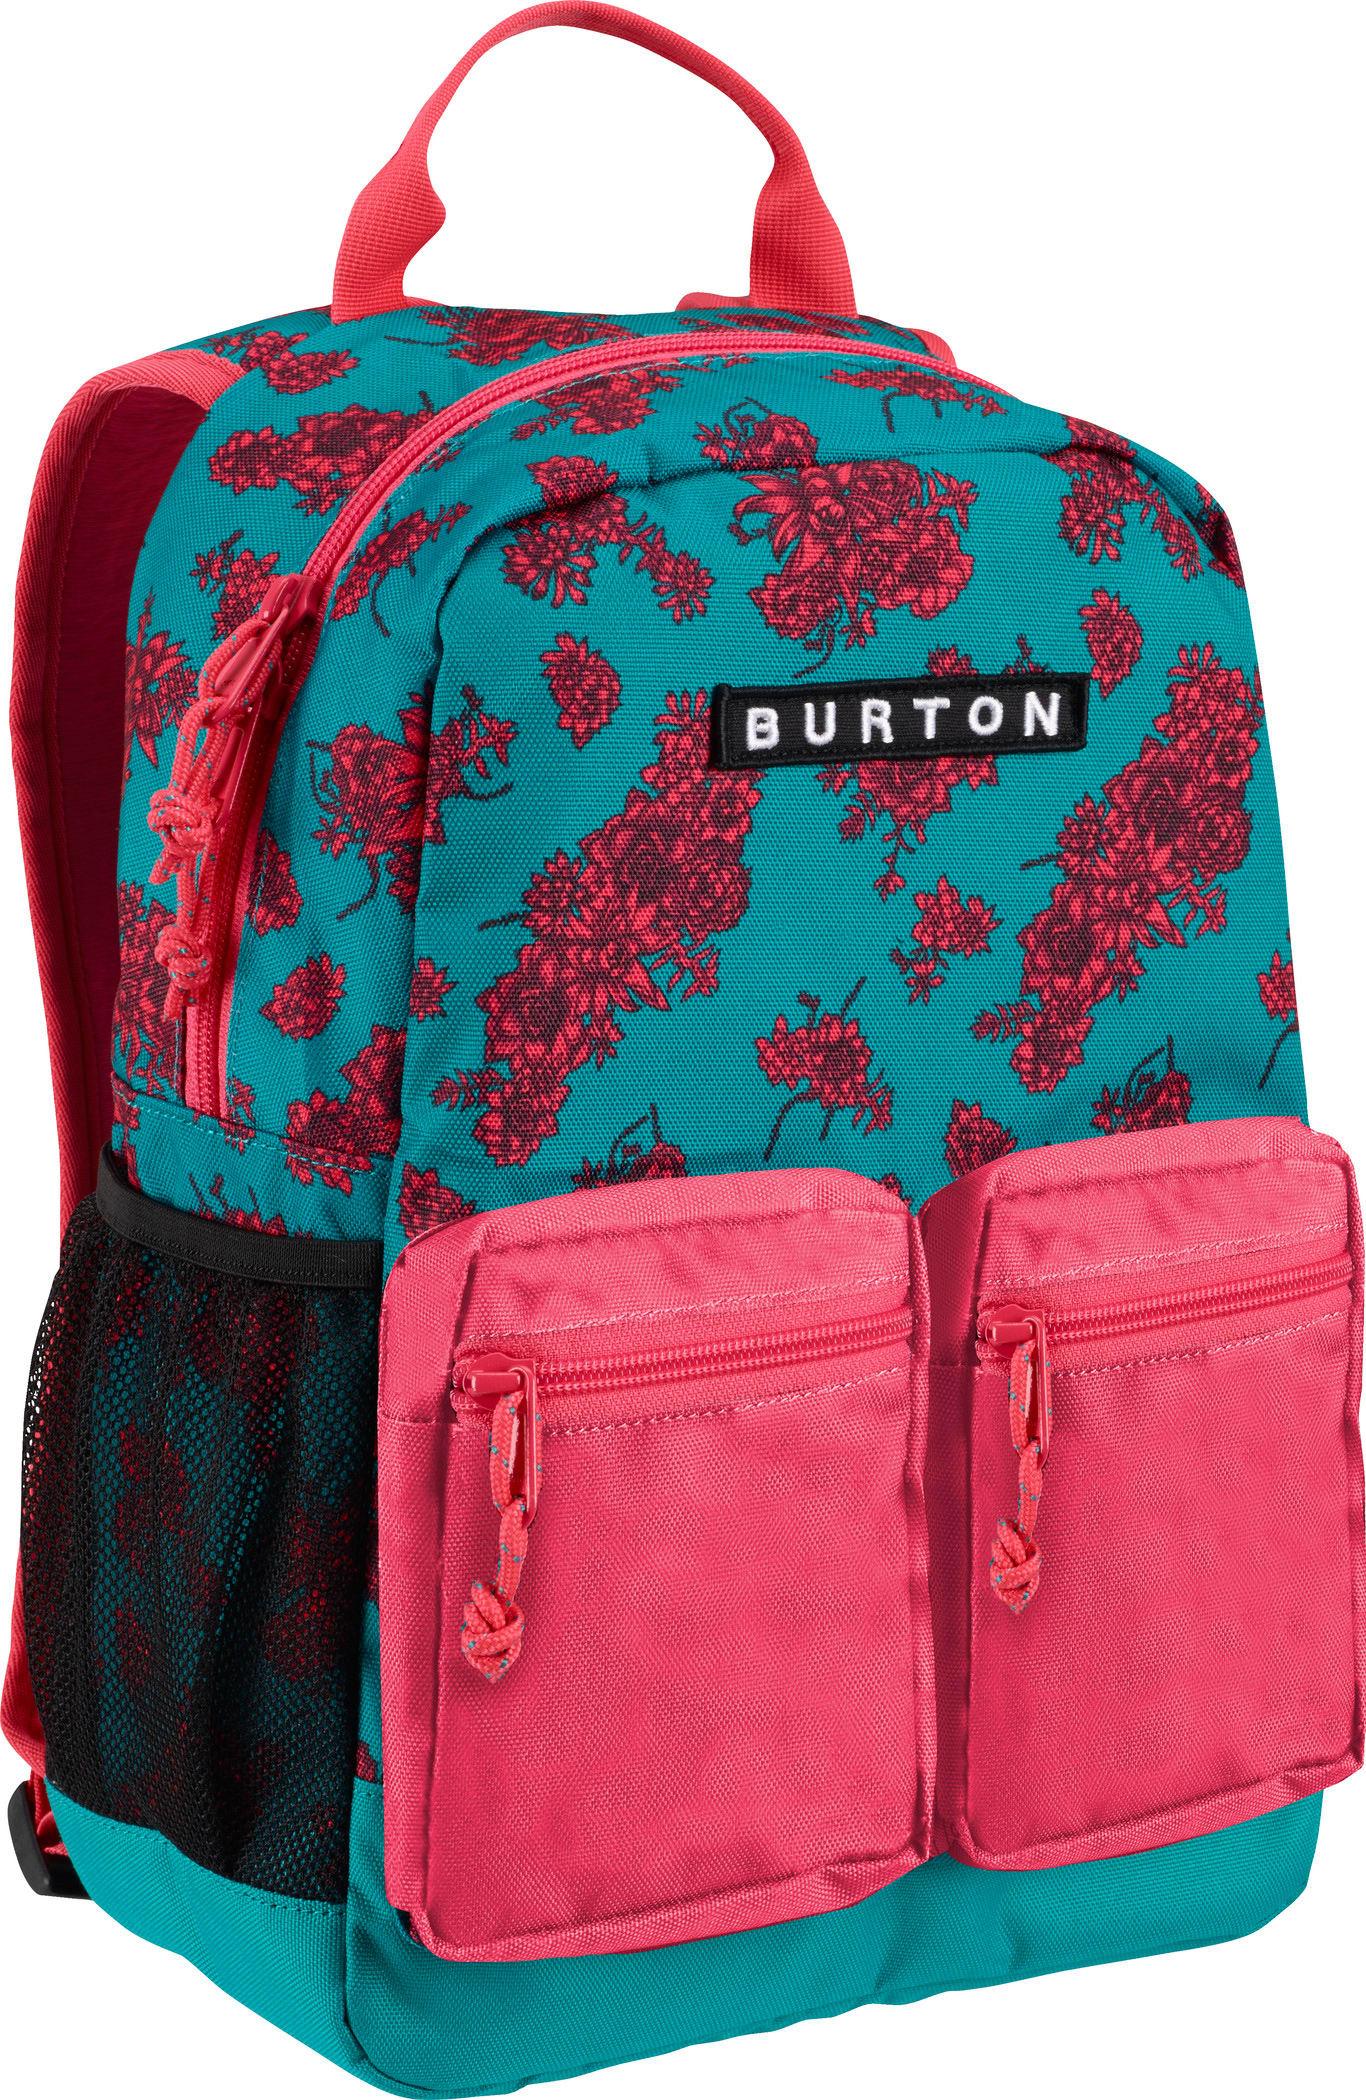 Burton Gromlet Backpack bt5grmg15ps16zz-burton-backpacks-bags